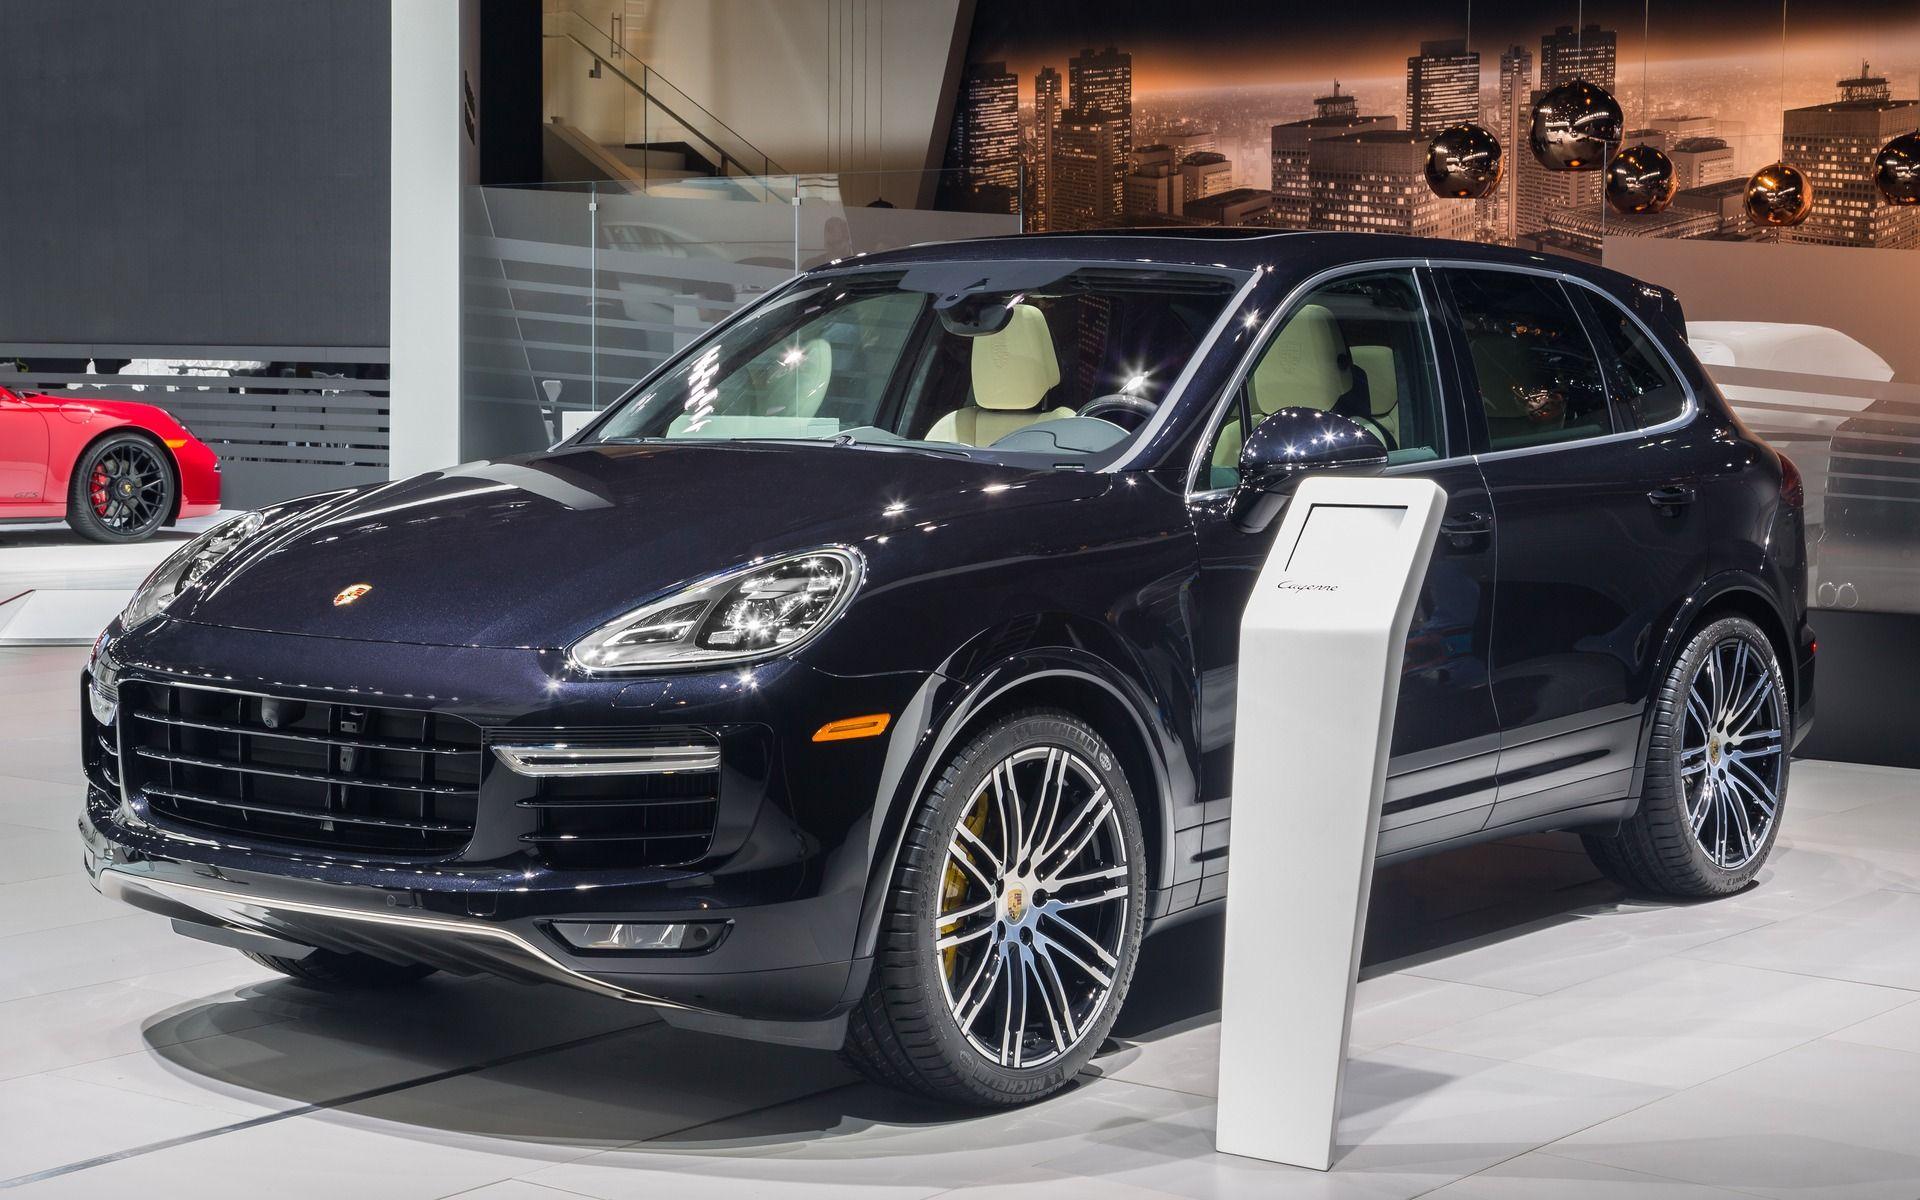 2016 Porsche Cayenne S E Hybrid Review Http Futurecarrelease